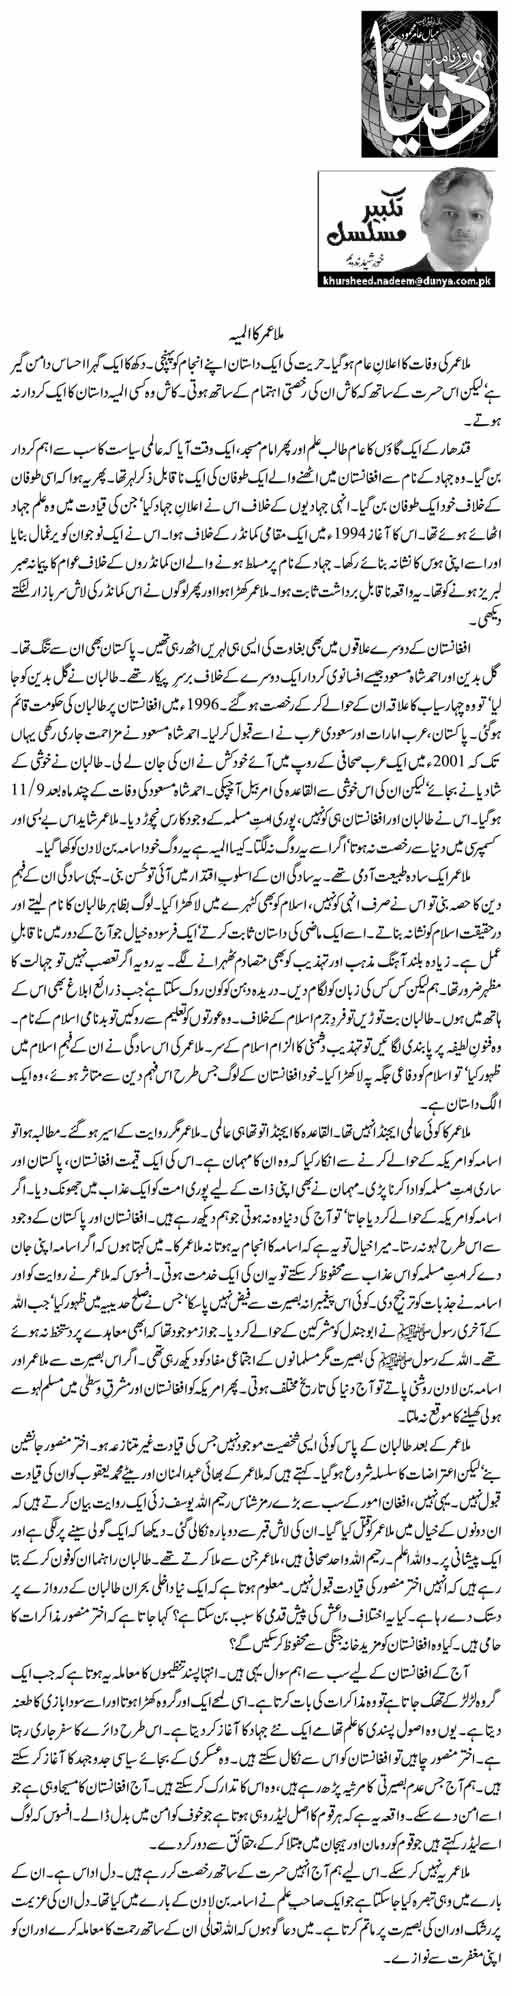 Mulla Umer Ka Almiya | Khursheed Nadeem | Daily Urdu Columns